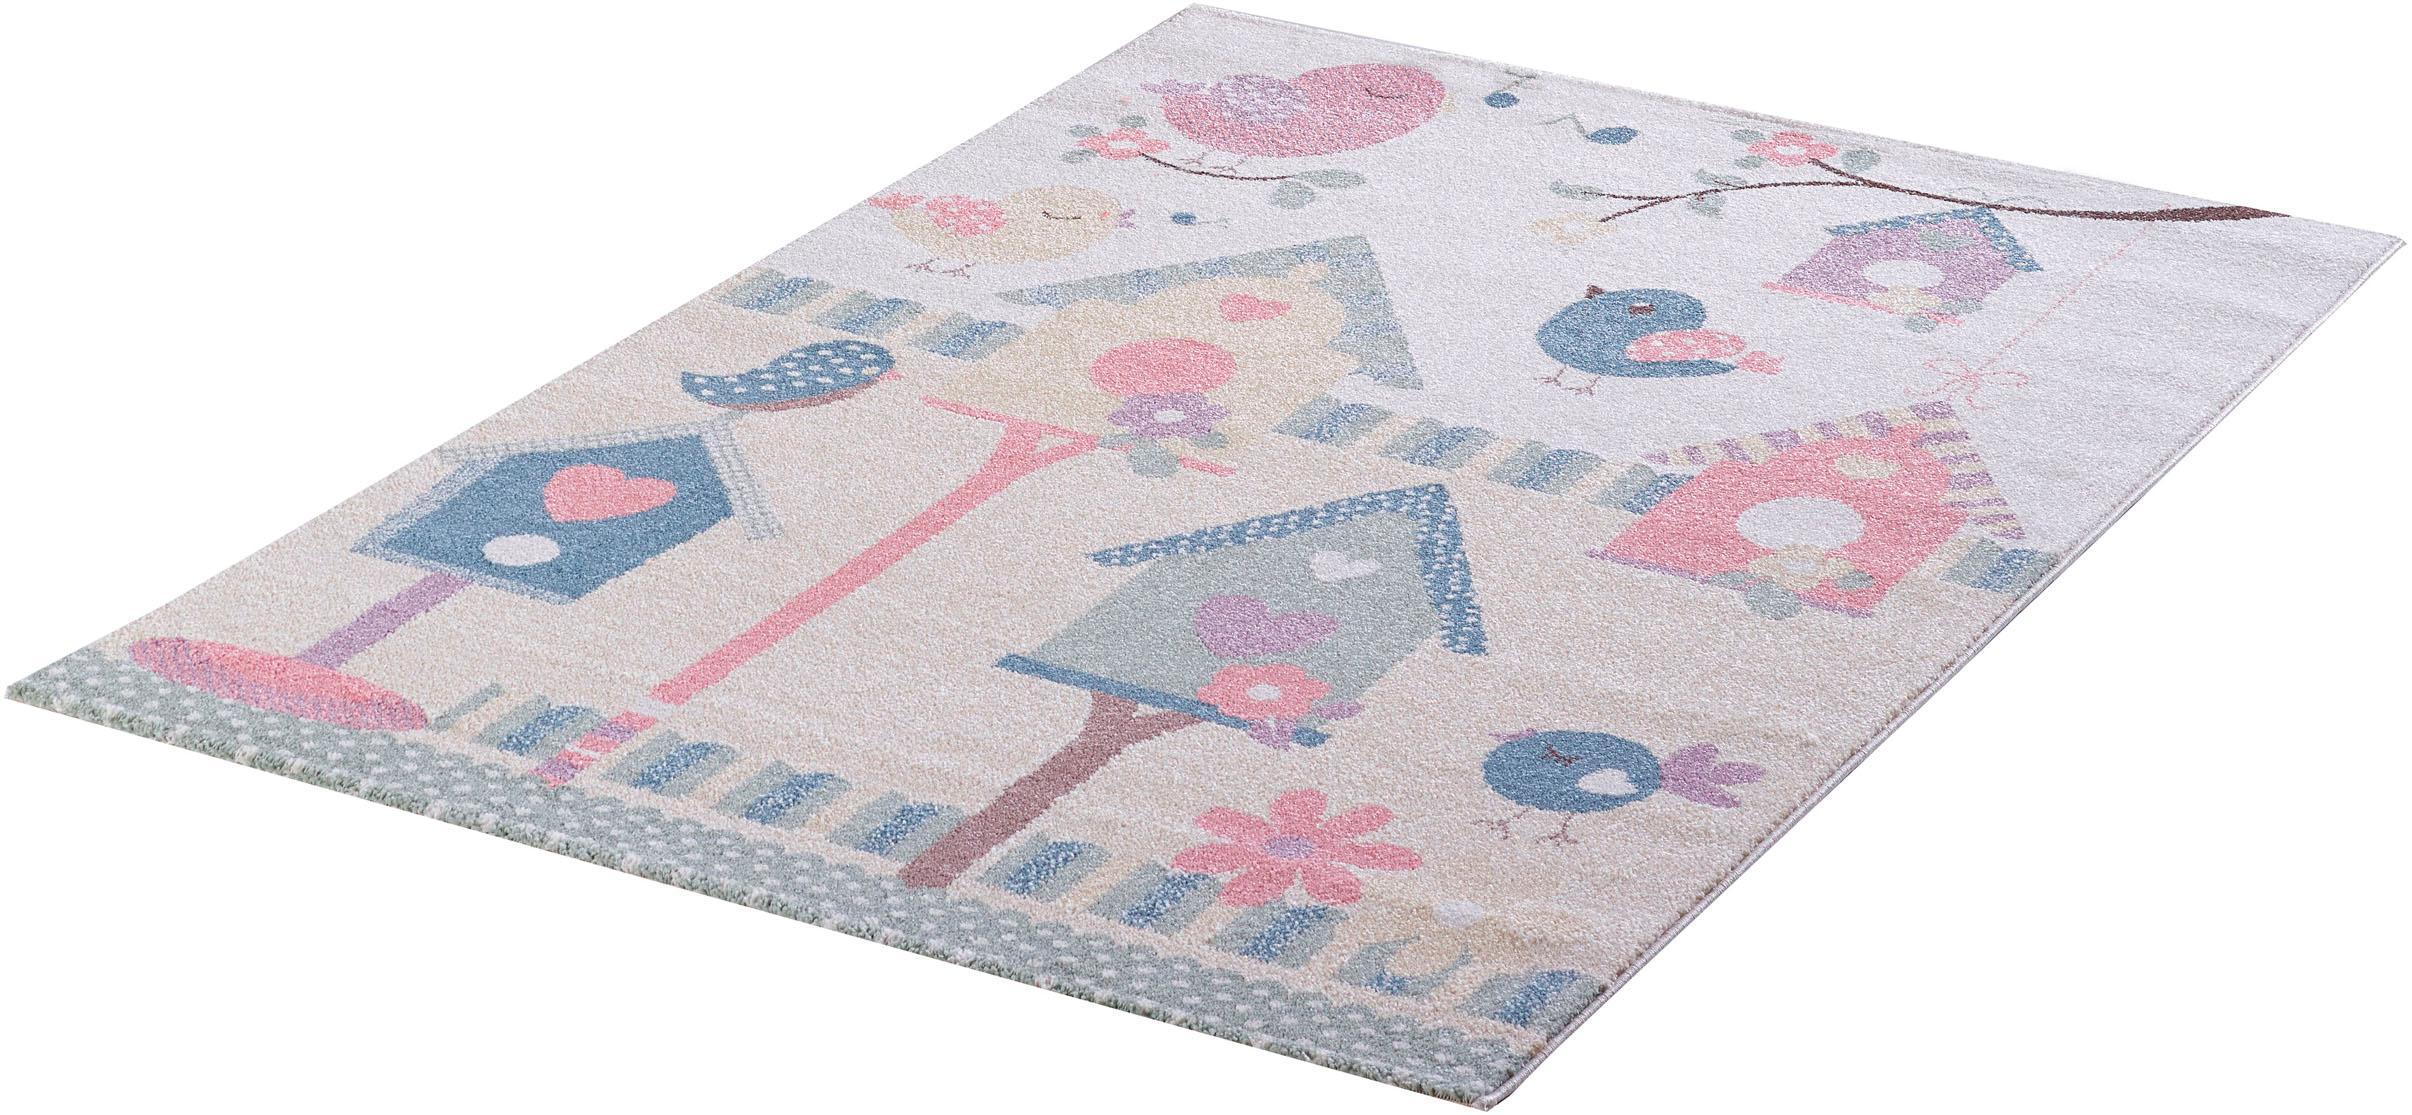 Kinderteppich Luna Kids 4601 Sanat Teppiche rechteckig Höhe 12 mm maschinell gewebt